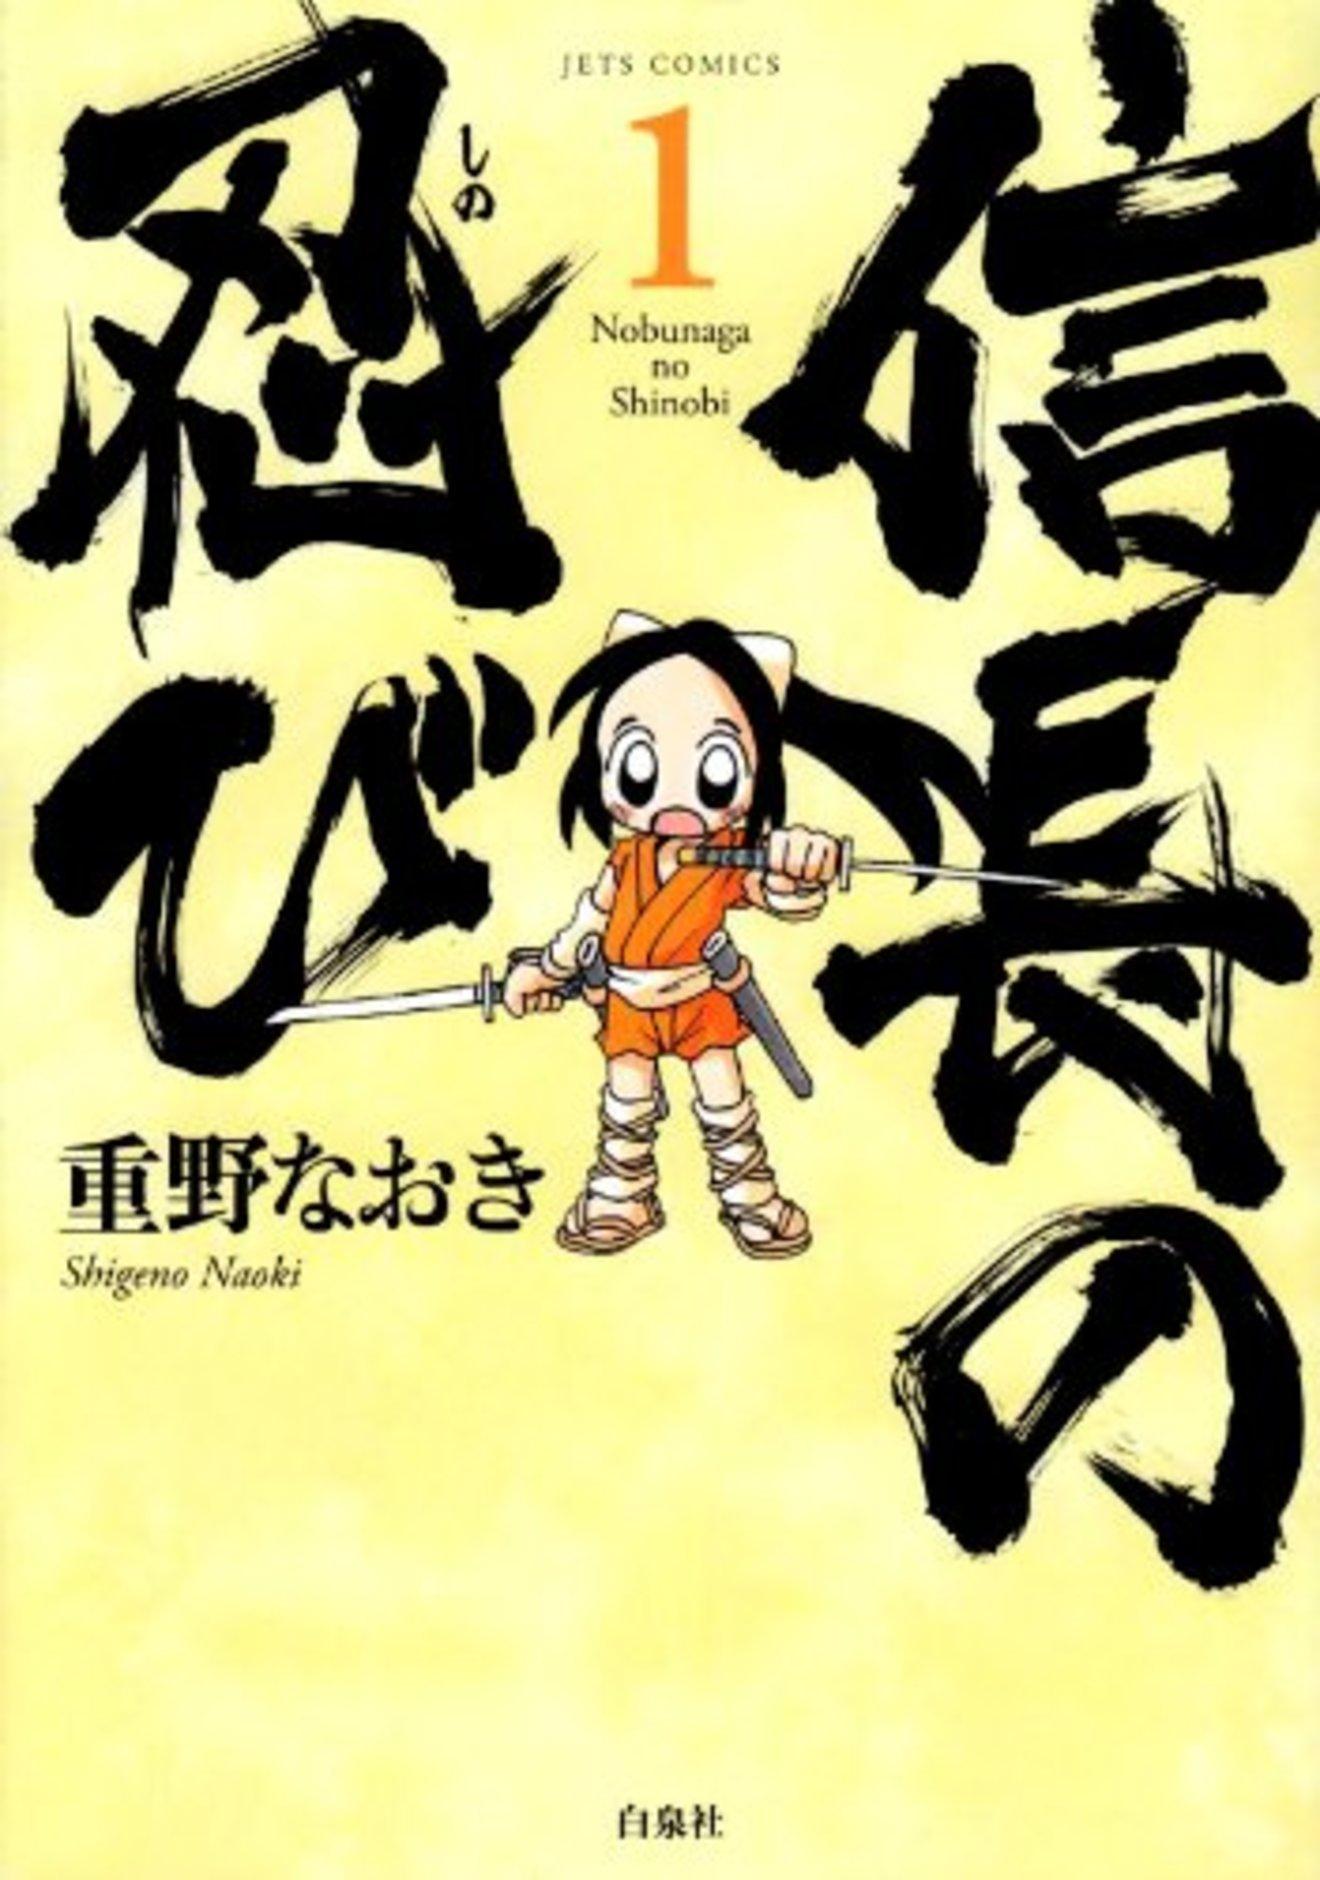 『NARUTO』以外のおすすめ忍者漫画ランキングベスト6!